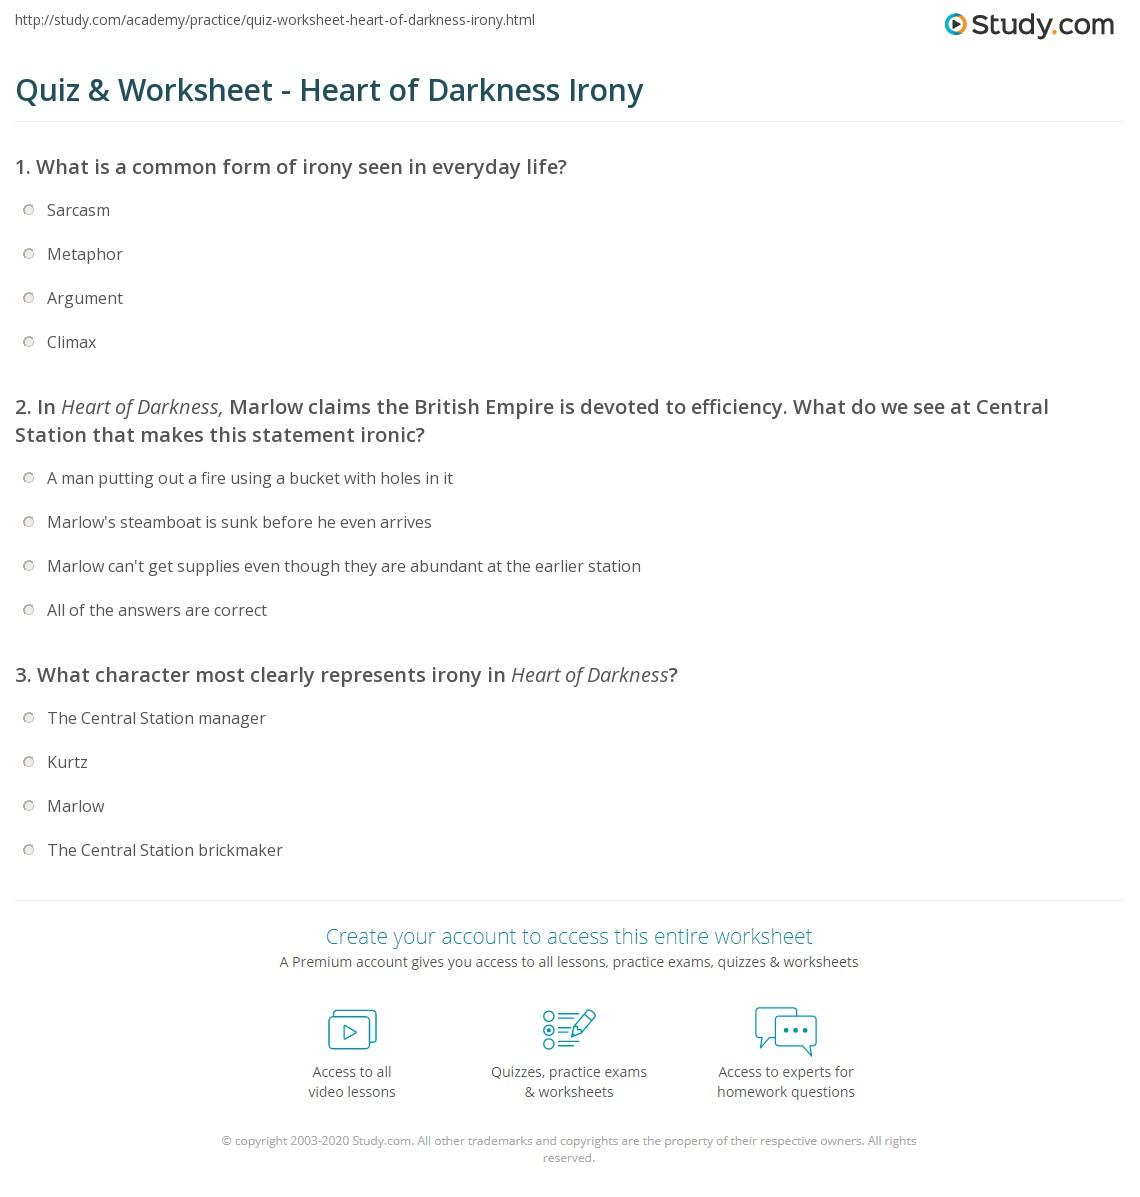 Quiz worksheet heart of darkness irony study irony in heart of darkness buycottarizona Images